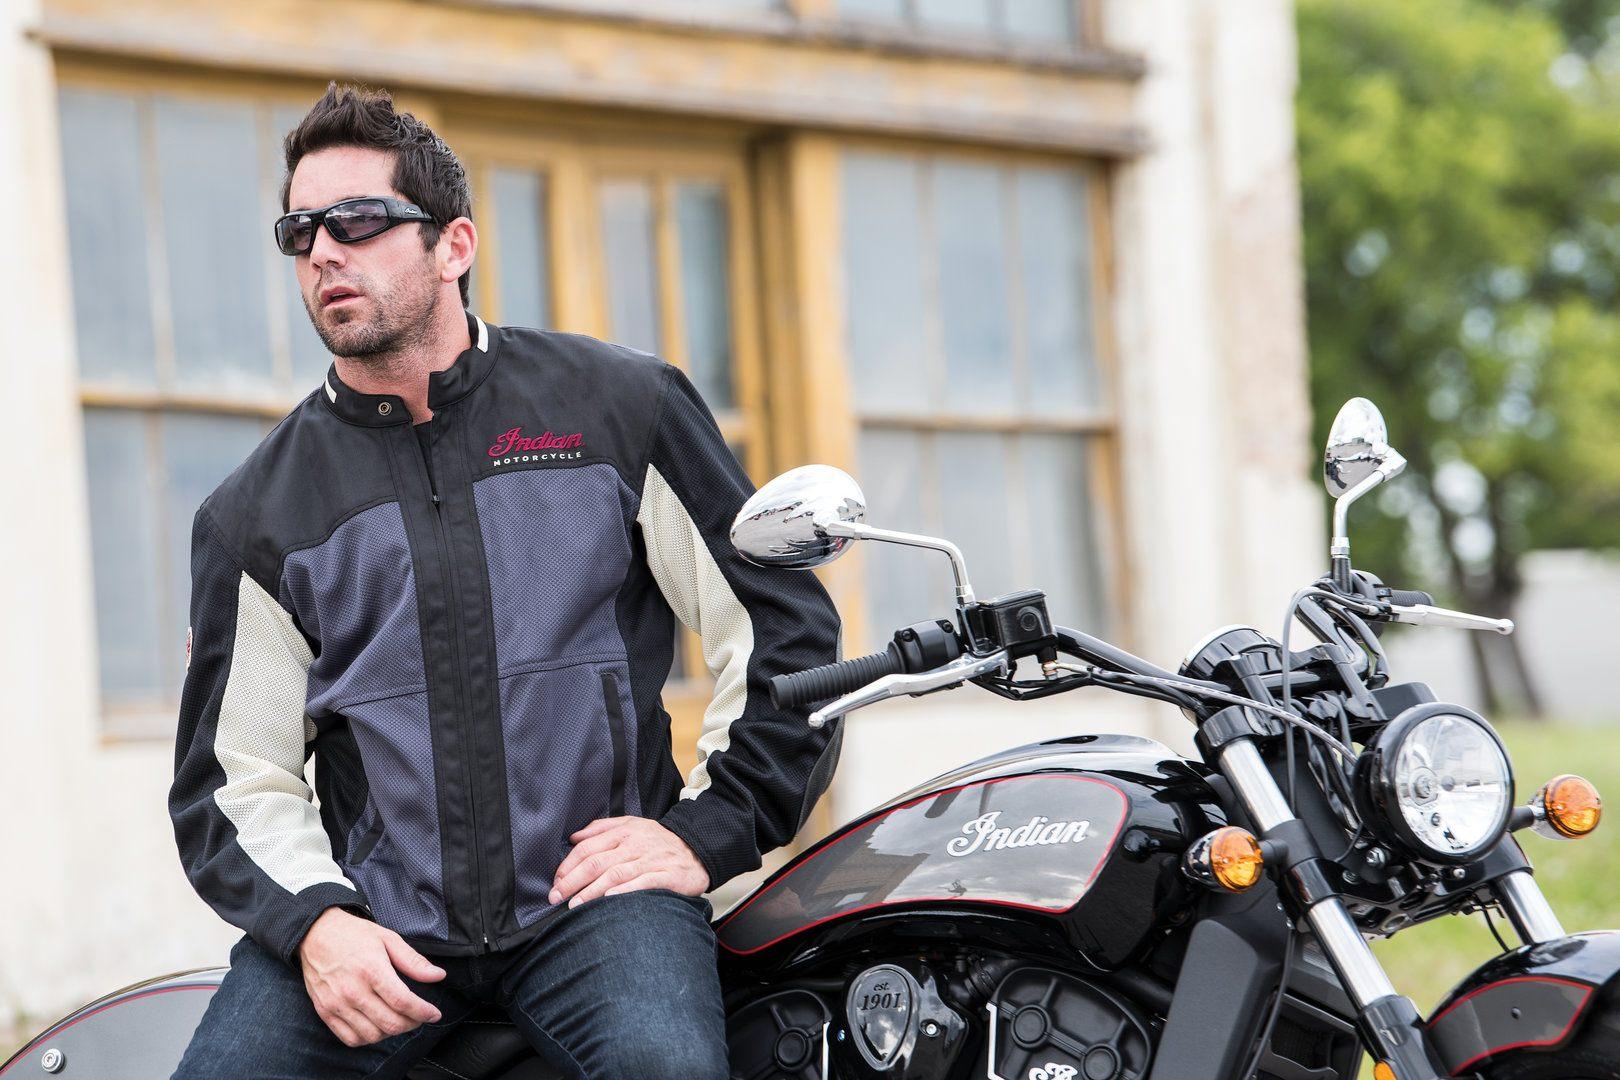 Accesorios Indian - chaqueta Drifter Mesh y gafas Performance